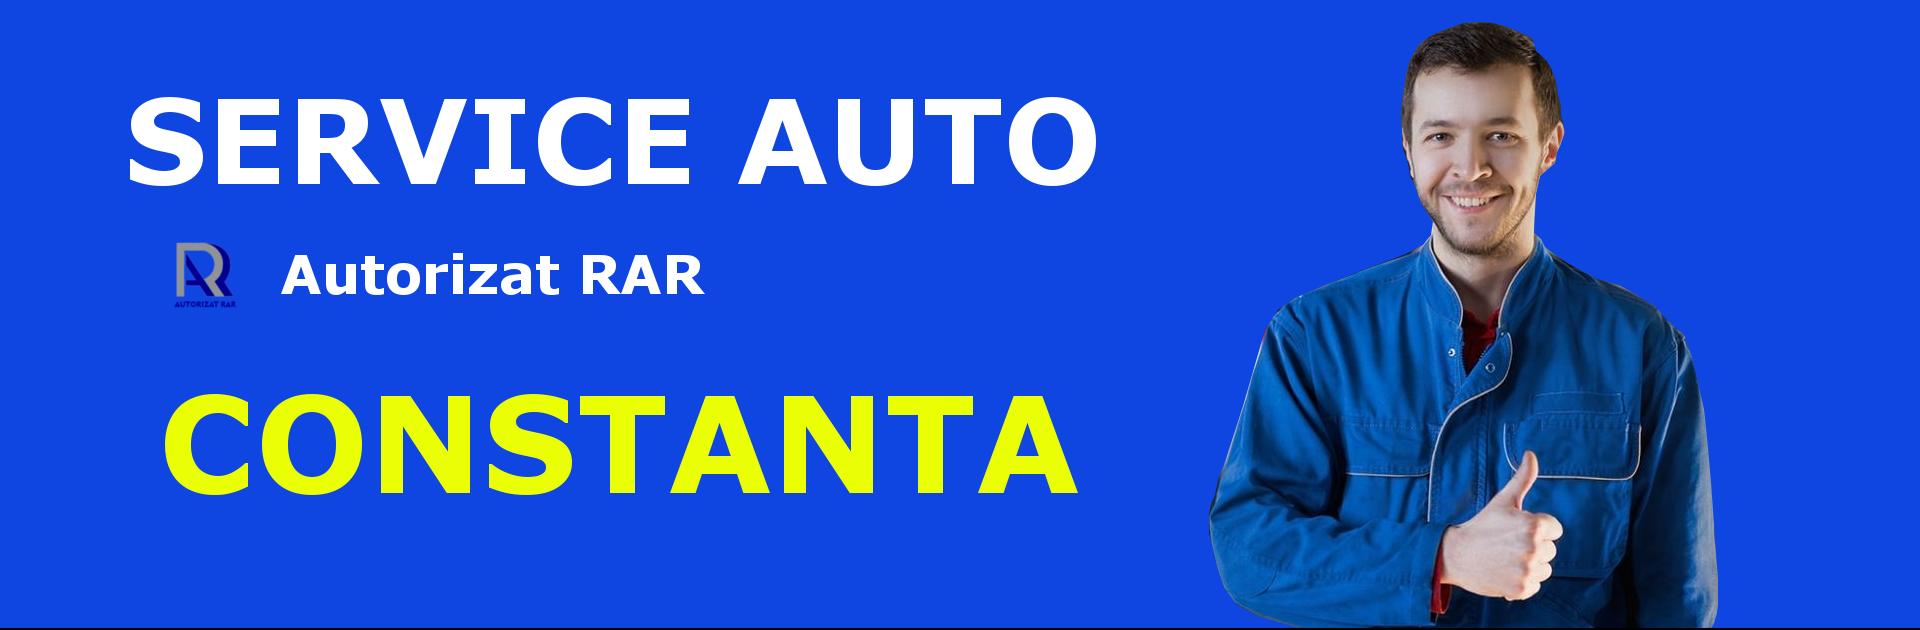 Banner service CONSTANTA